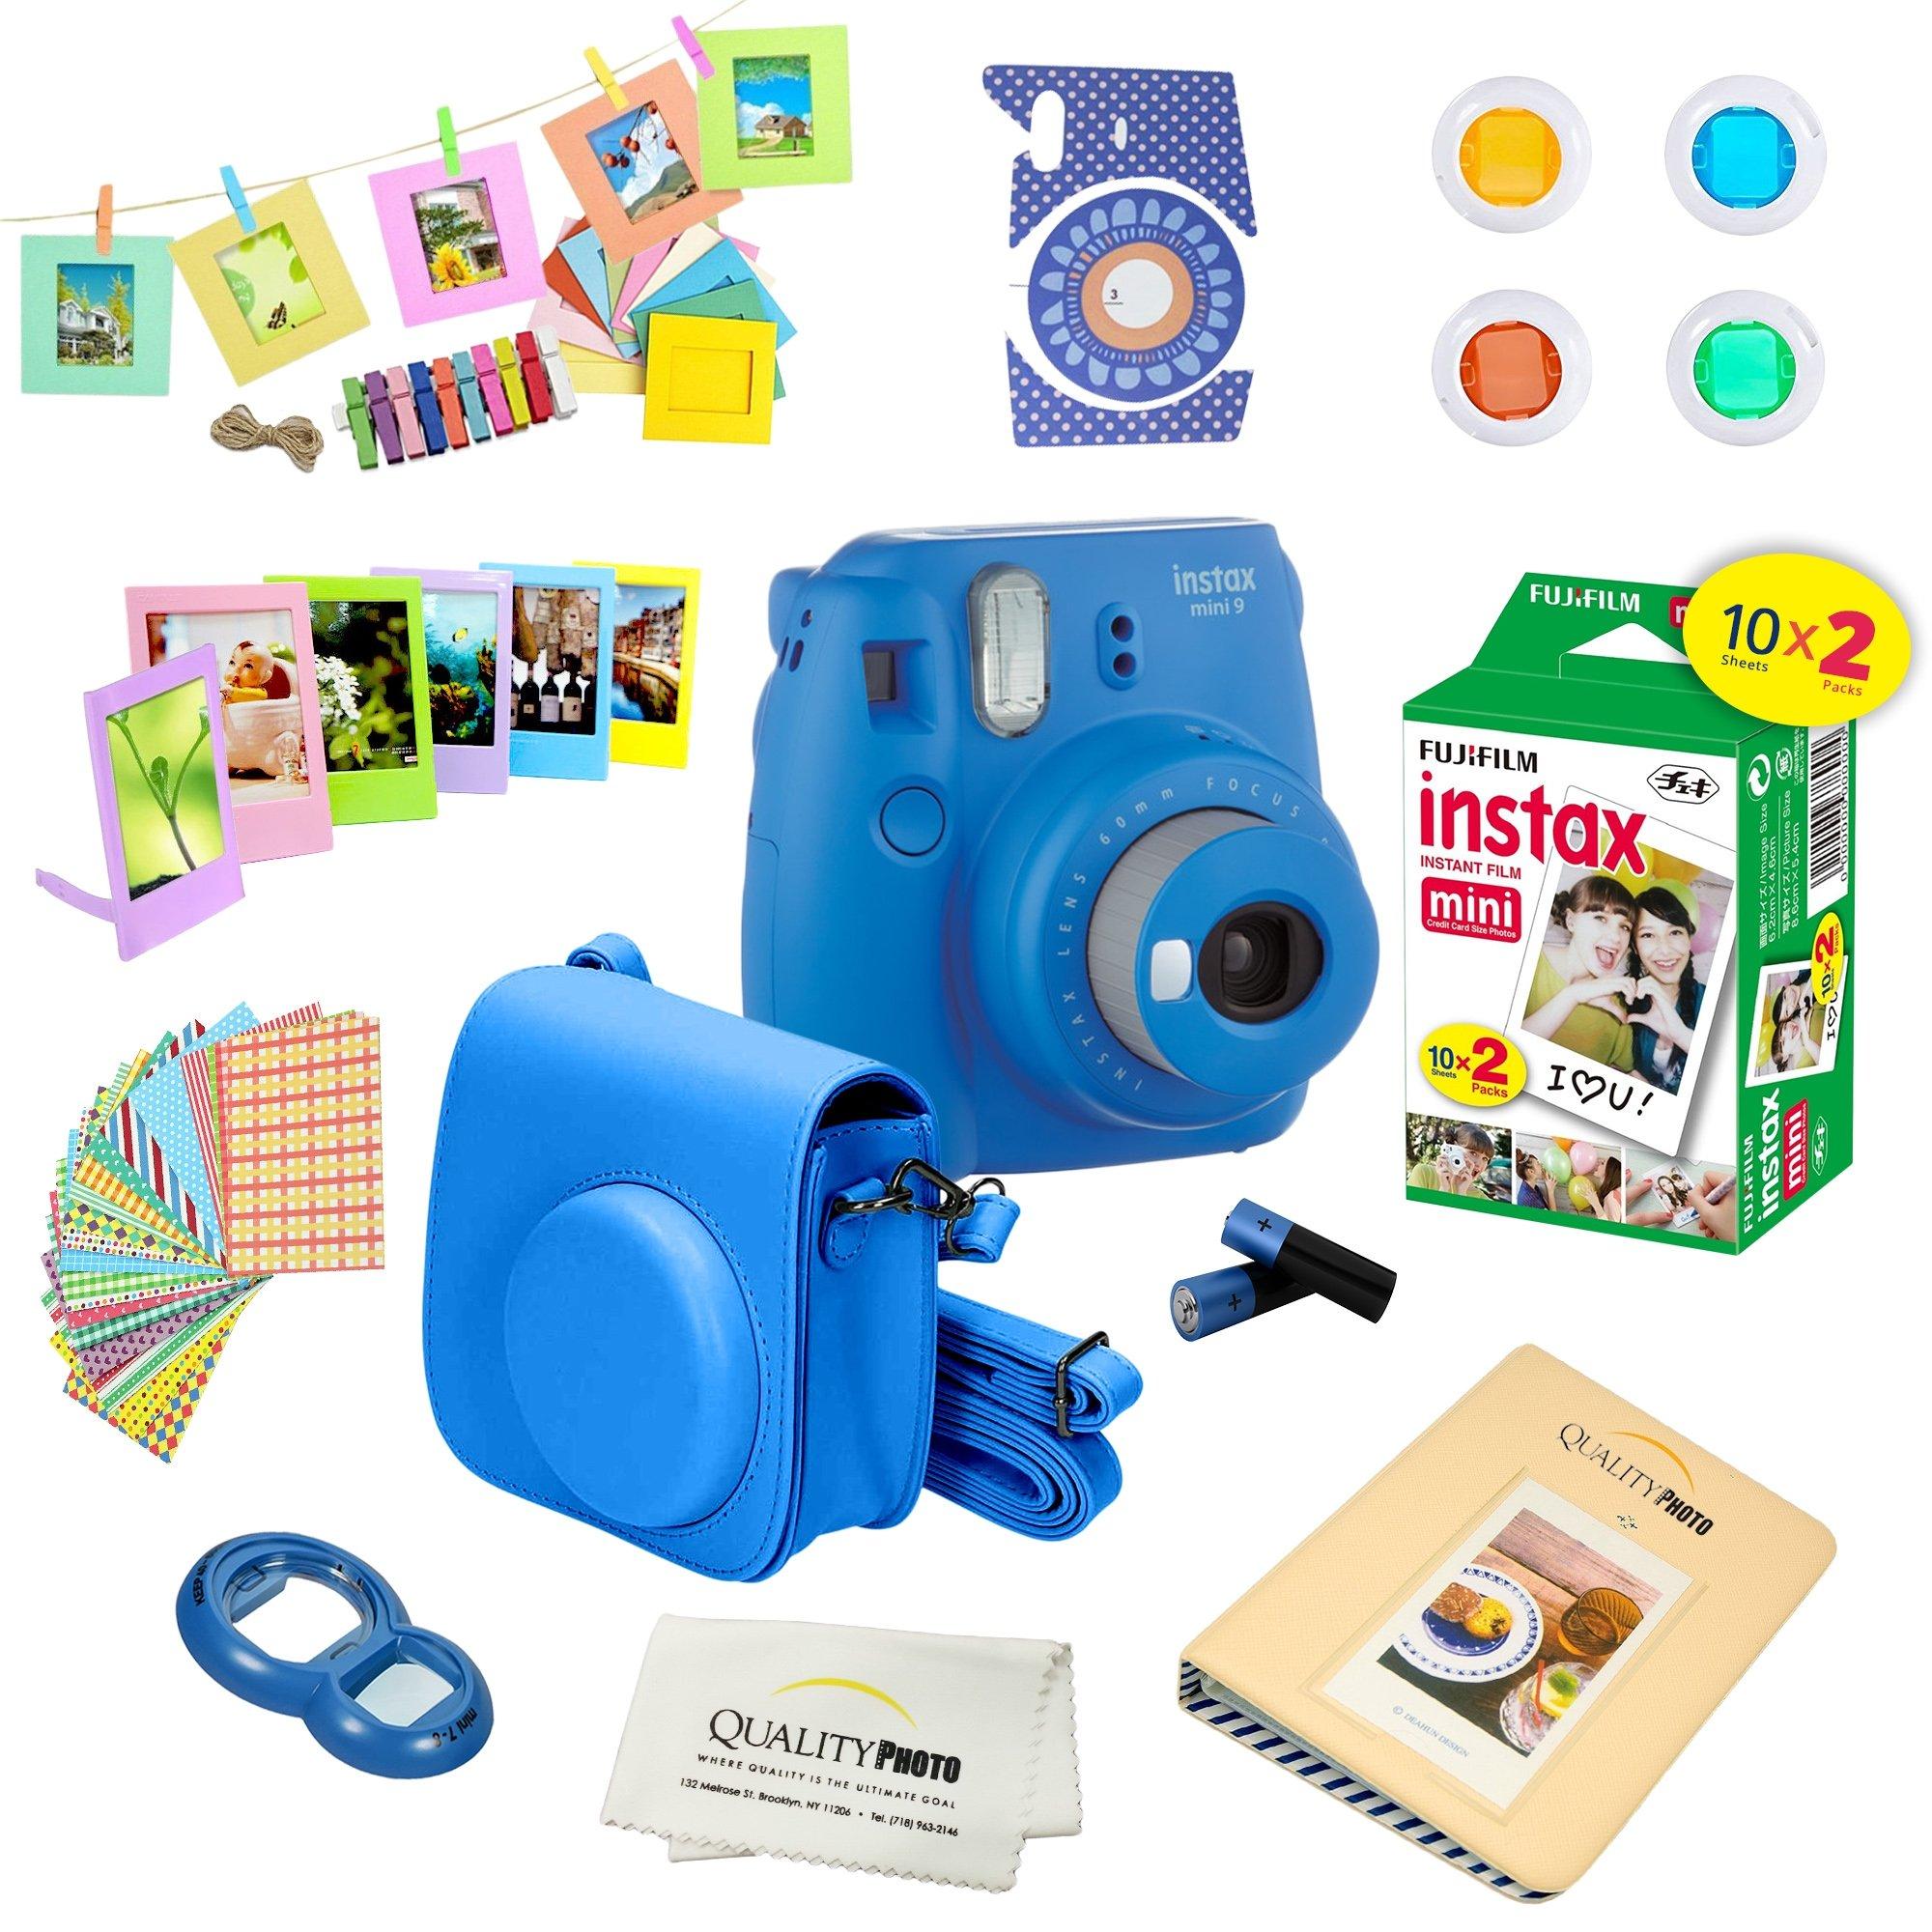 Fujifilm Instax Mini 9 Instant Camera – COBALT BLUE + Fuji INSTAX Film (20 Exposures) + Multifarious Instax Accessory Kit BUNDLE Includes; Case/Strap & Album + Fun Frames/Stickers/Lenses + MORE by Quality photo